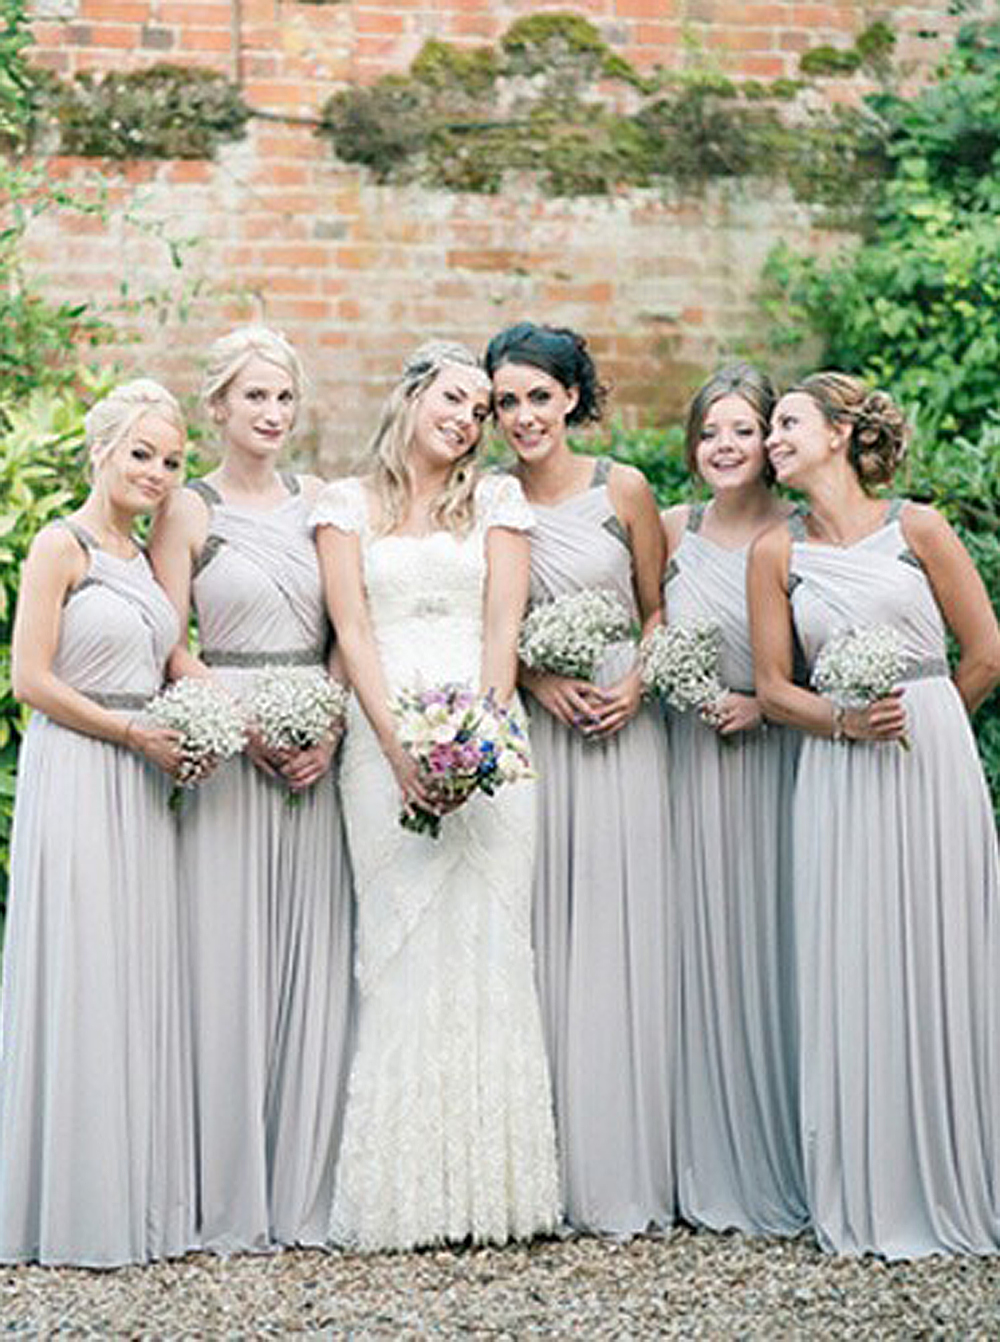 Exquisite Floor-Length Sleeveless Grey Bridesmaid Dress with Beading